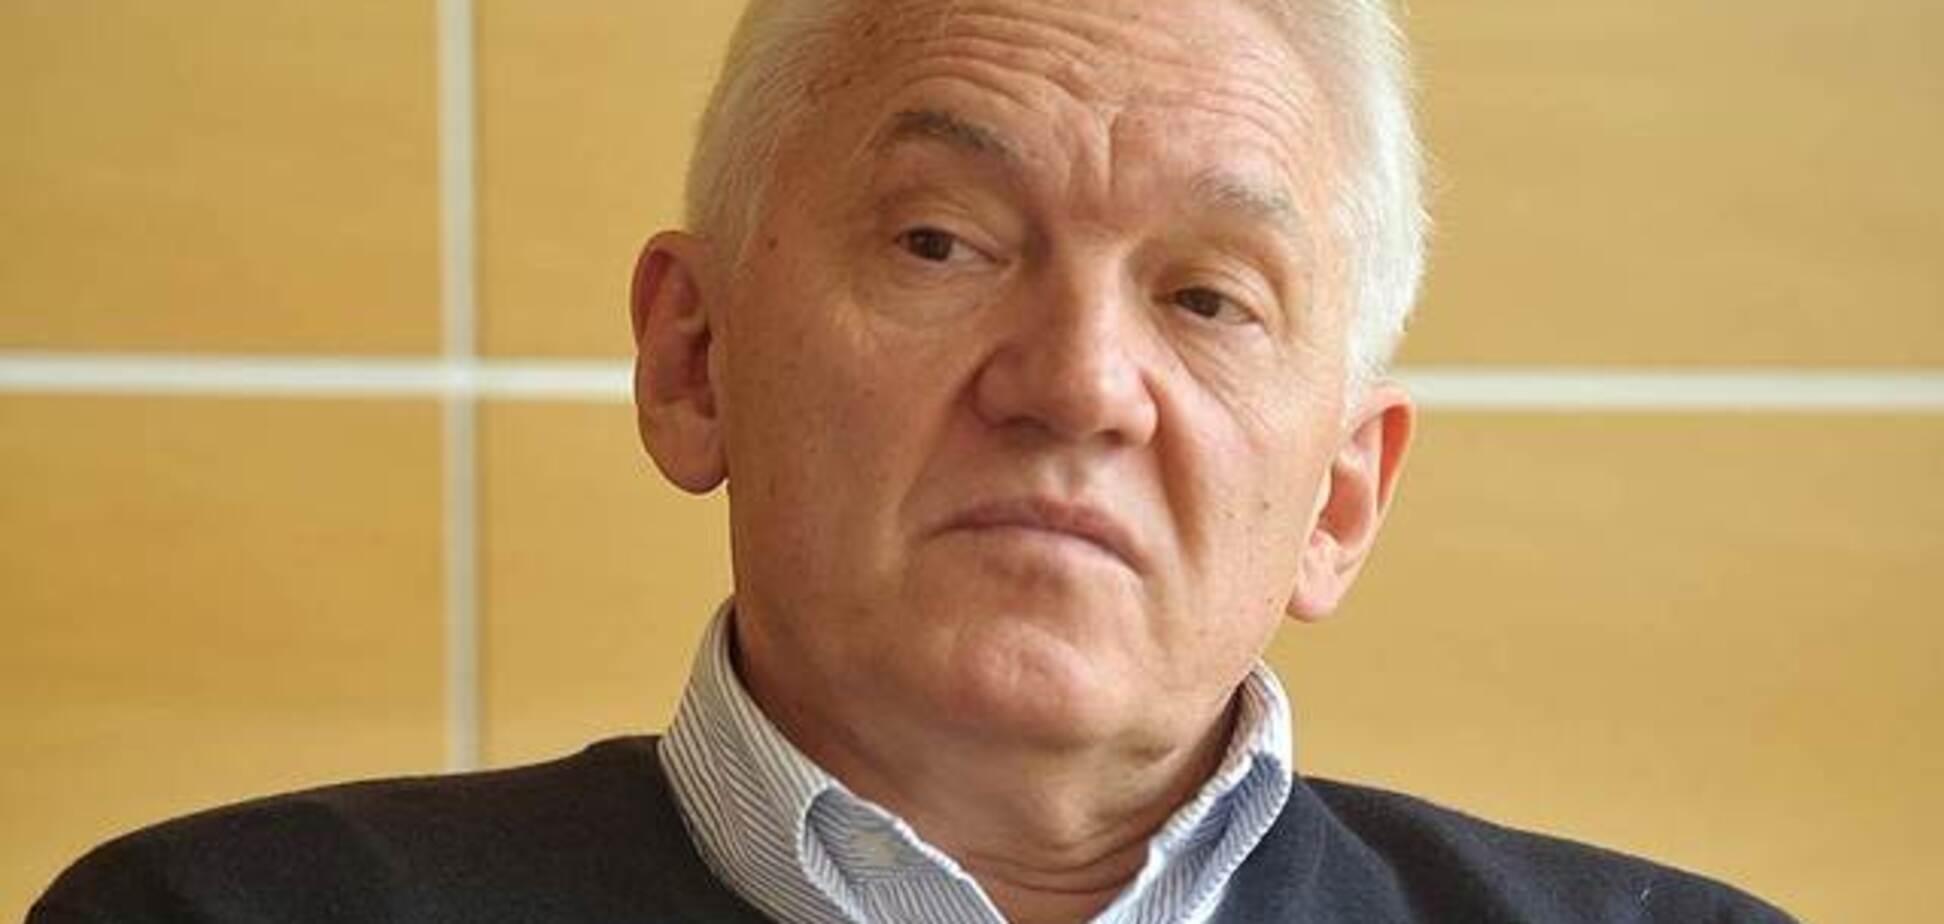 Летал пес Путина: санкции лишили друга президента России элитного самолета